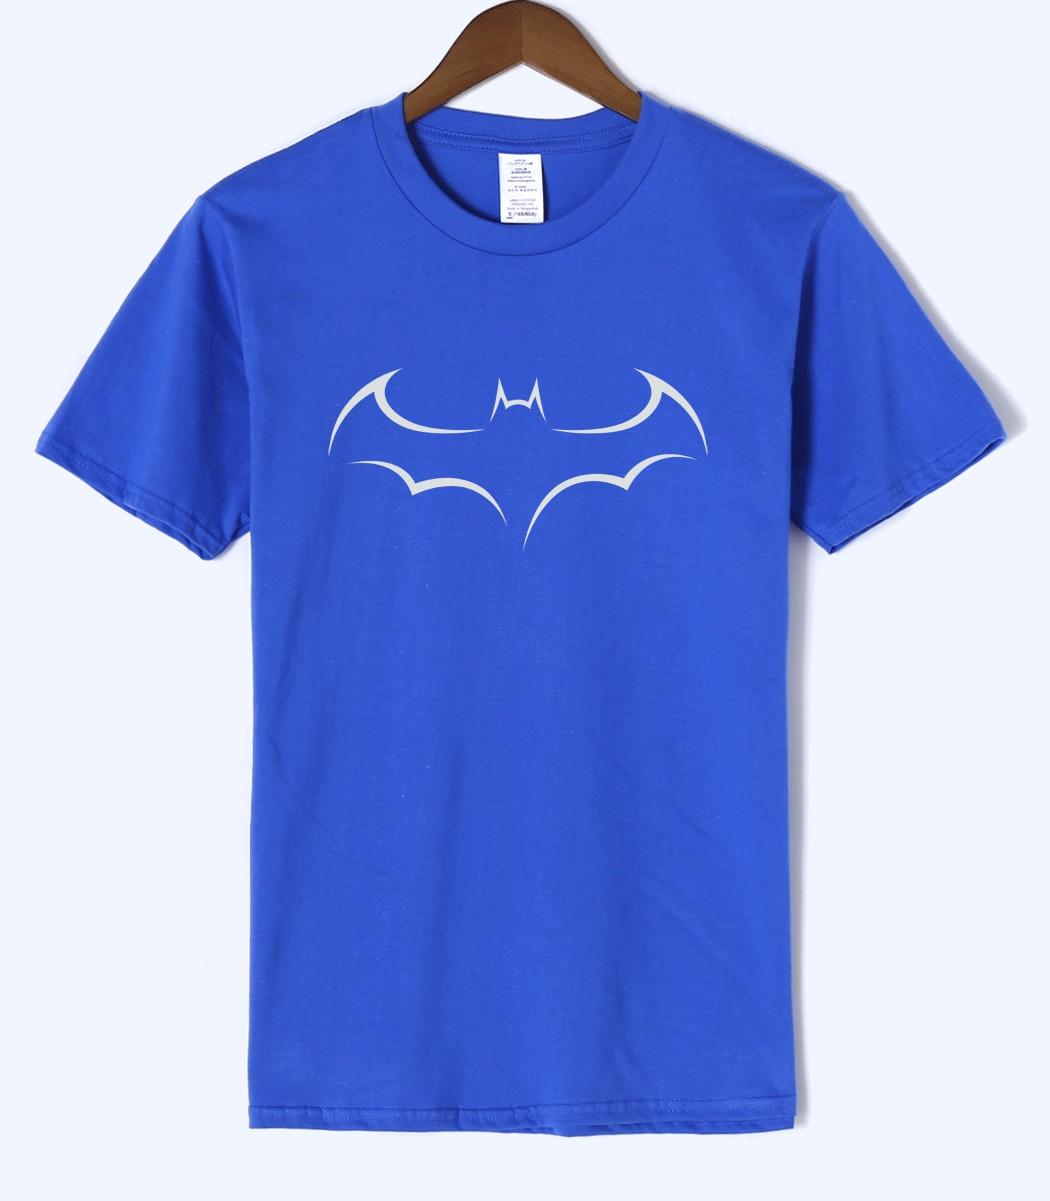 Batman Stick Figures Printed Men's T Shirts 2019 Summer 100% Cotton Casual T-Shirt Men Short Sleeve O-Neck Cartoon TShirt S-XXXL